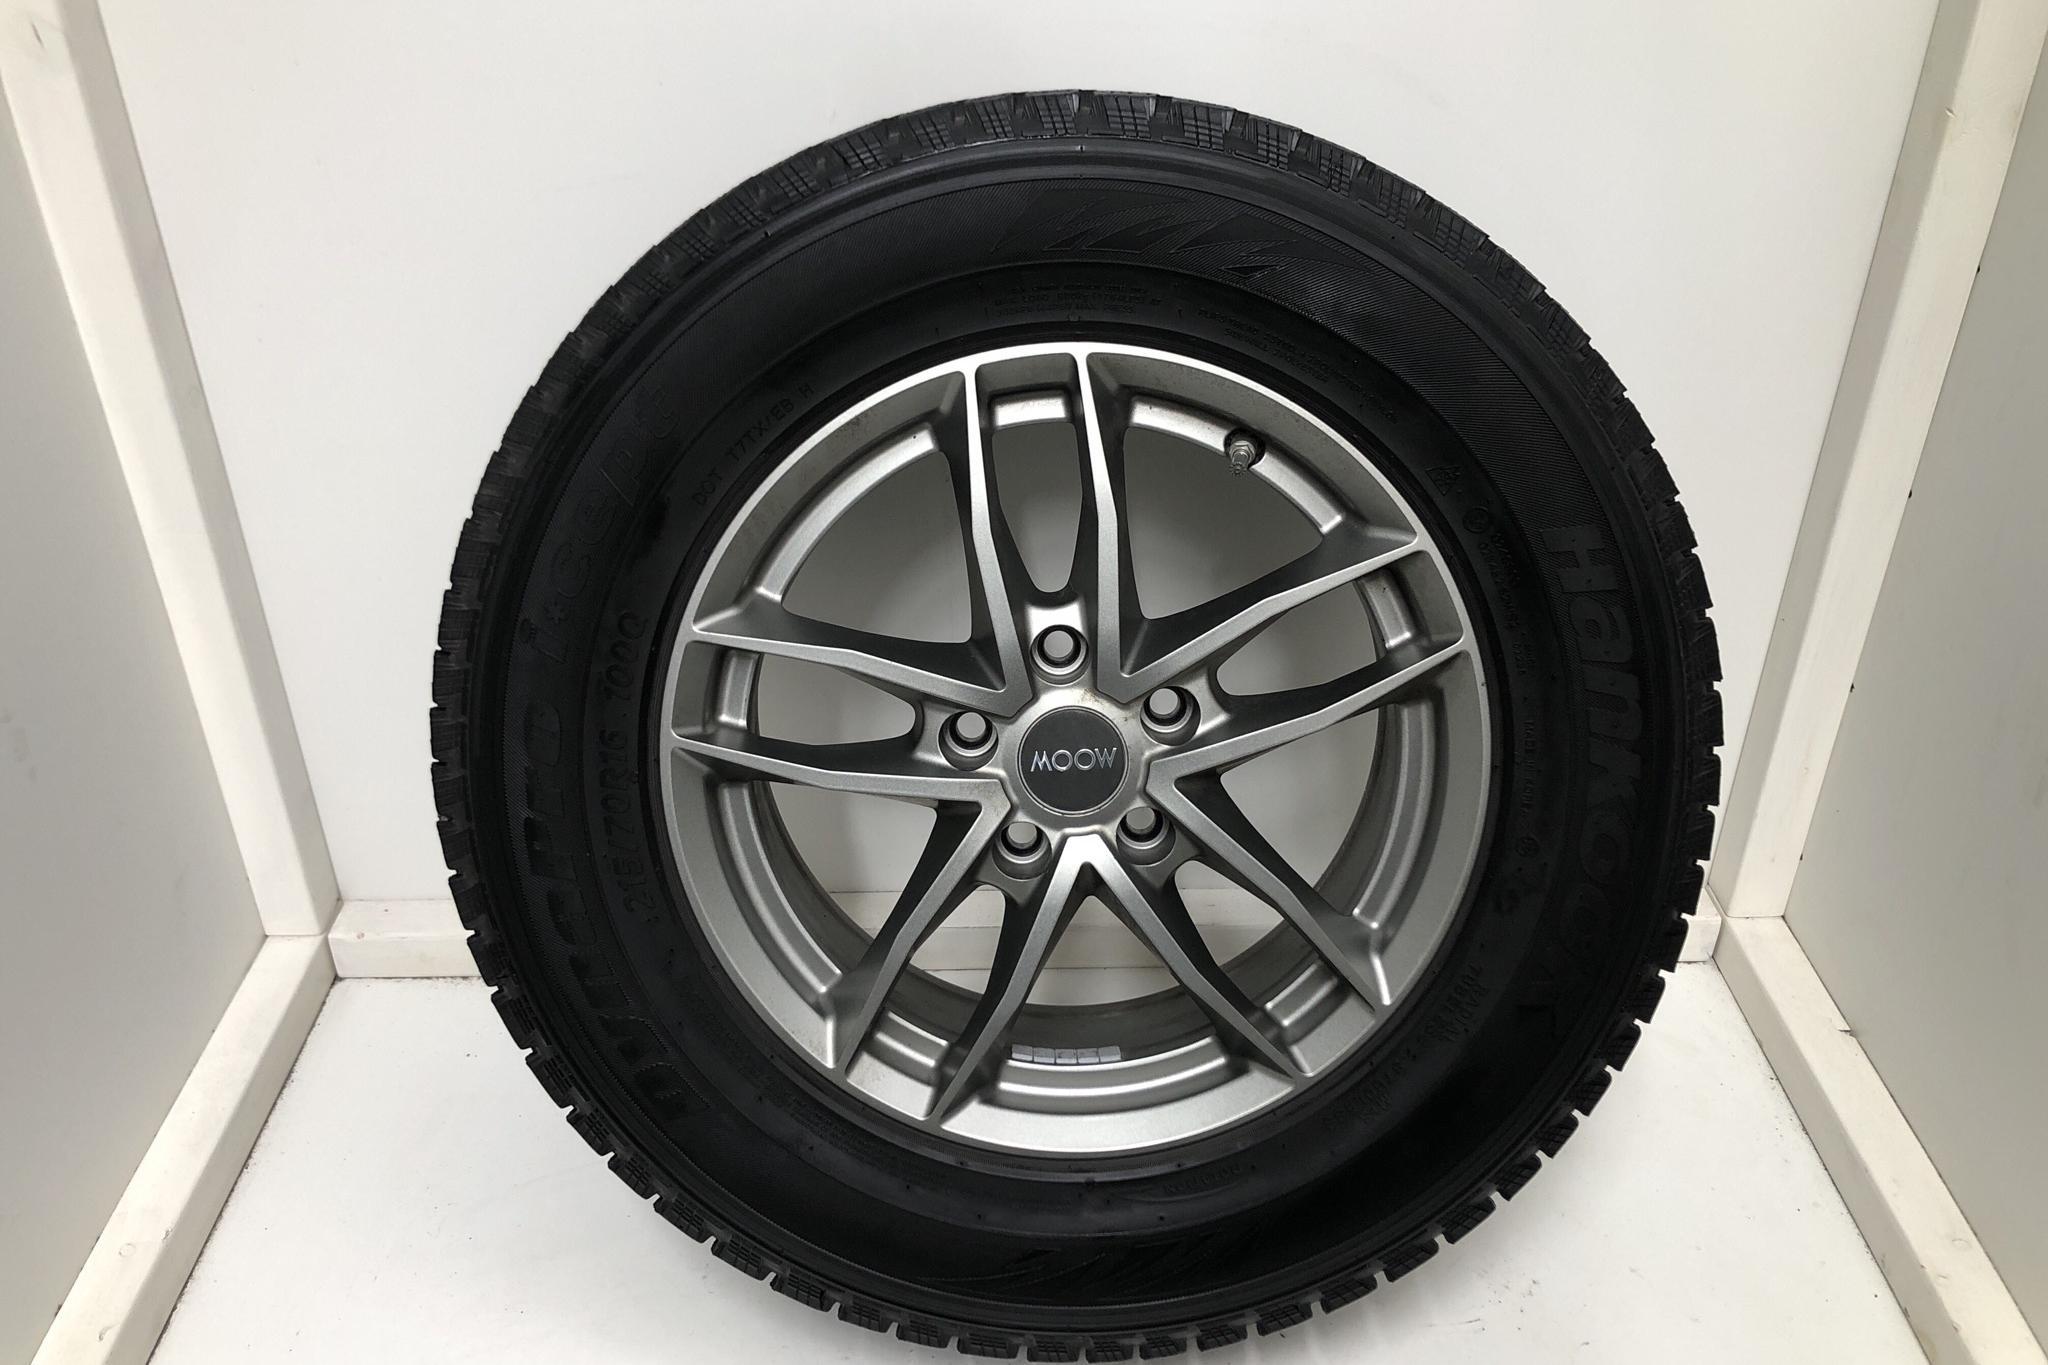 Mitsubishi Outlander 2.0 Plug-in Hybrid 4WD (121hk) - 4 539 mil - Automat - svart - 2018